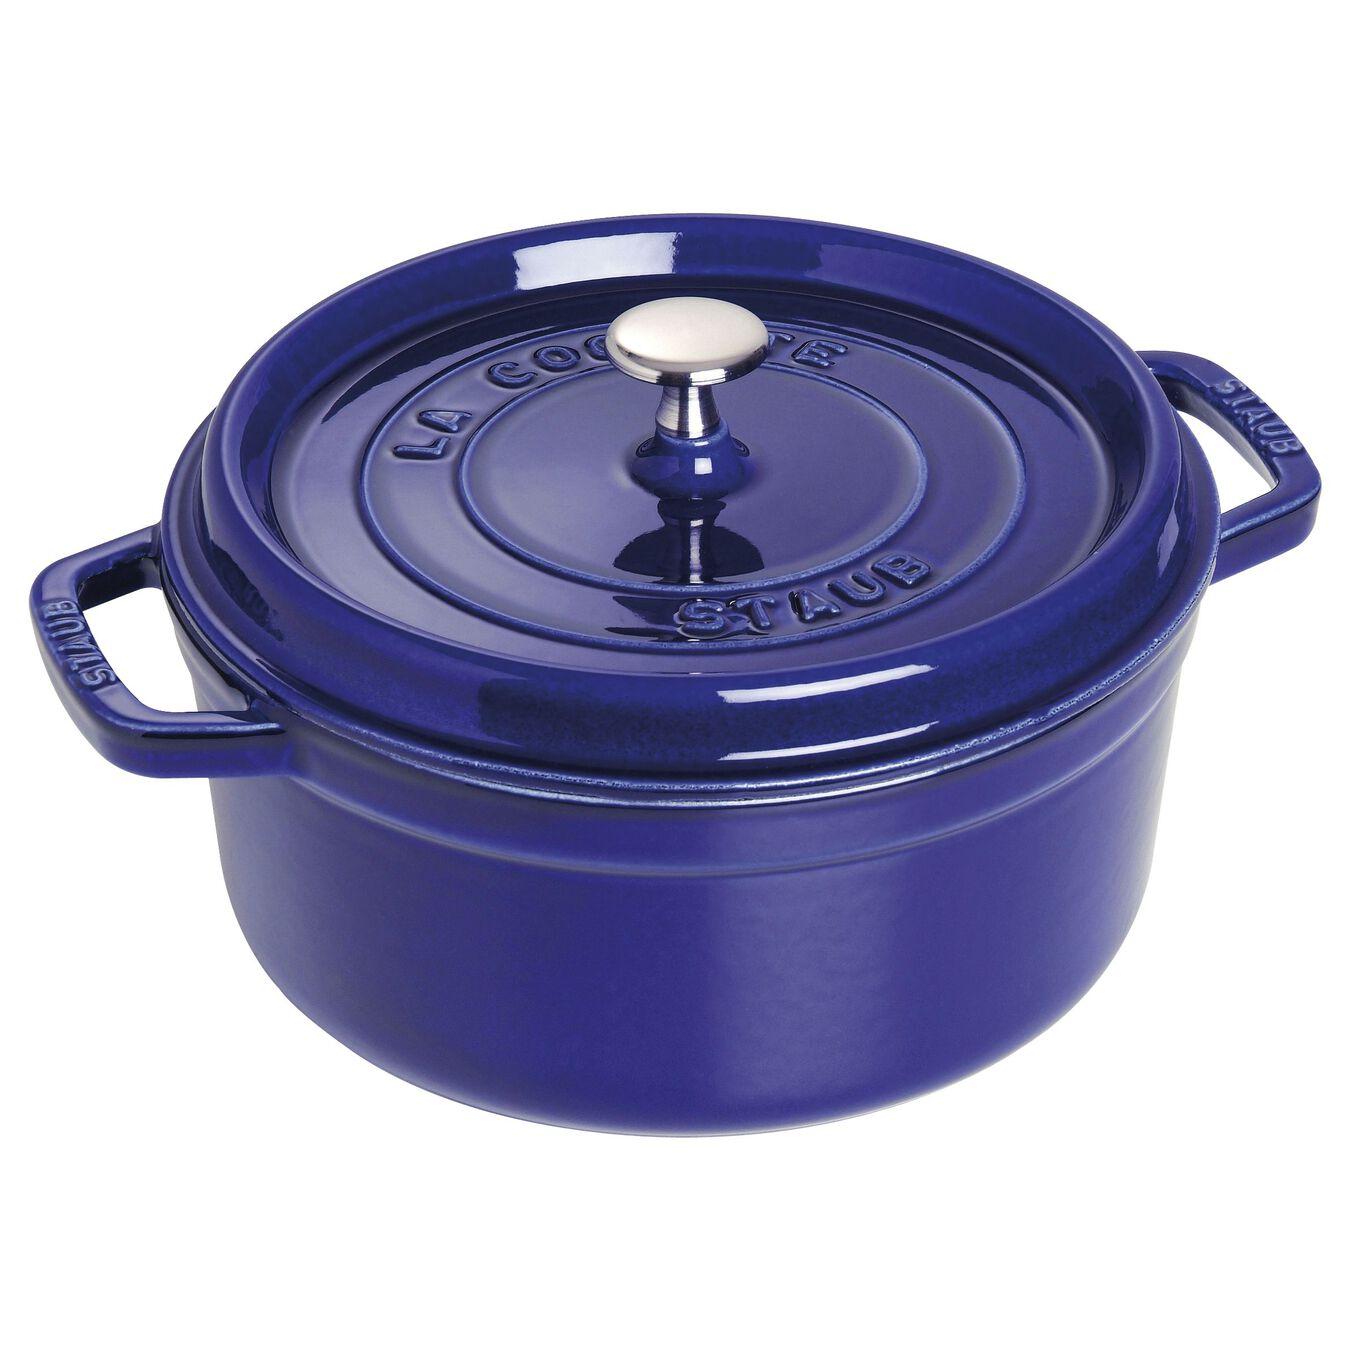 5.5-qt Round Cocotte - Dark Blue,,large 1